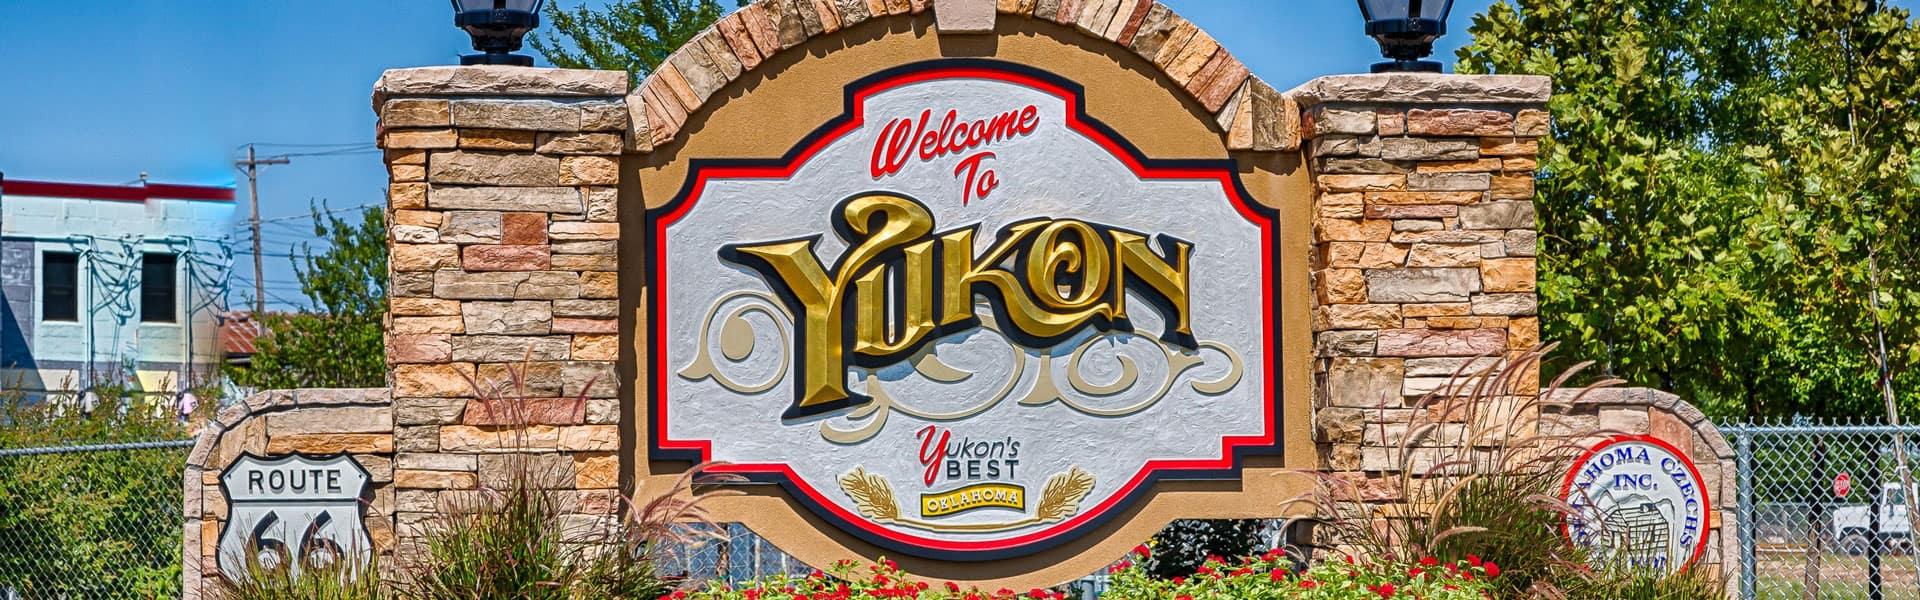 KIA Dealership in Yukon, OK